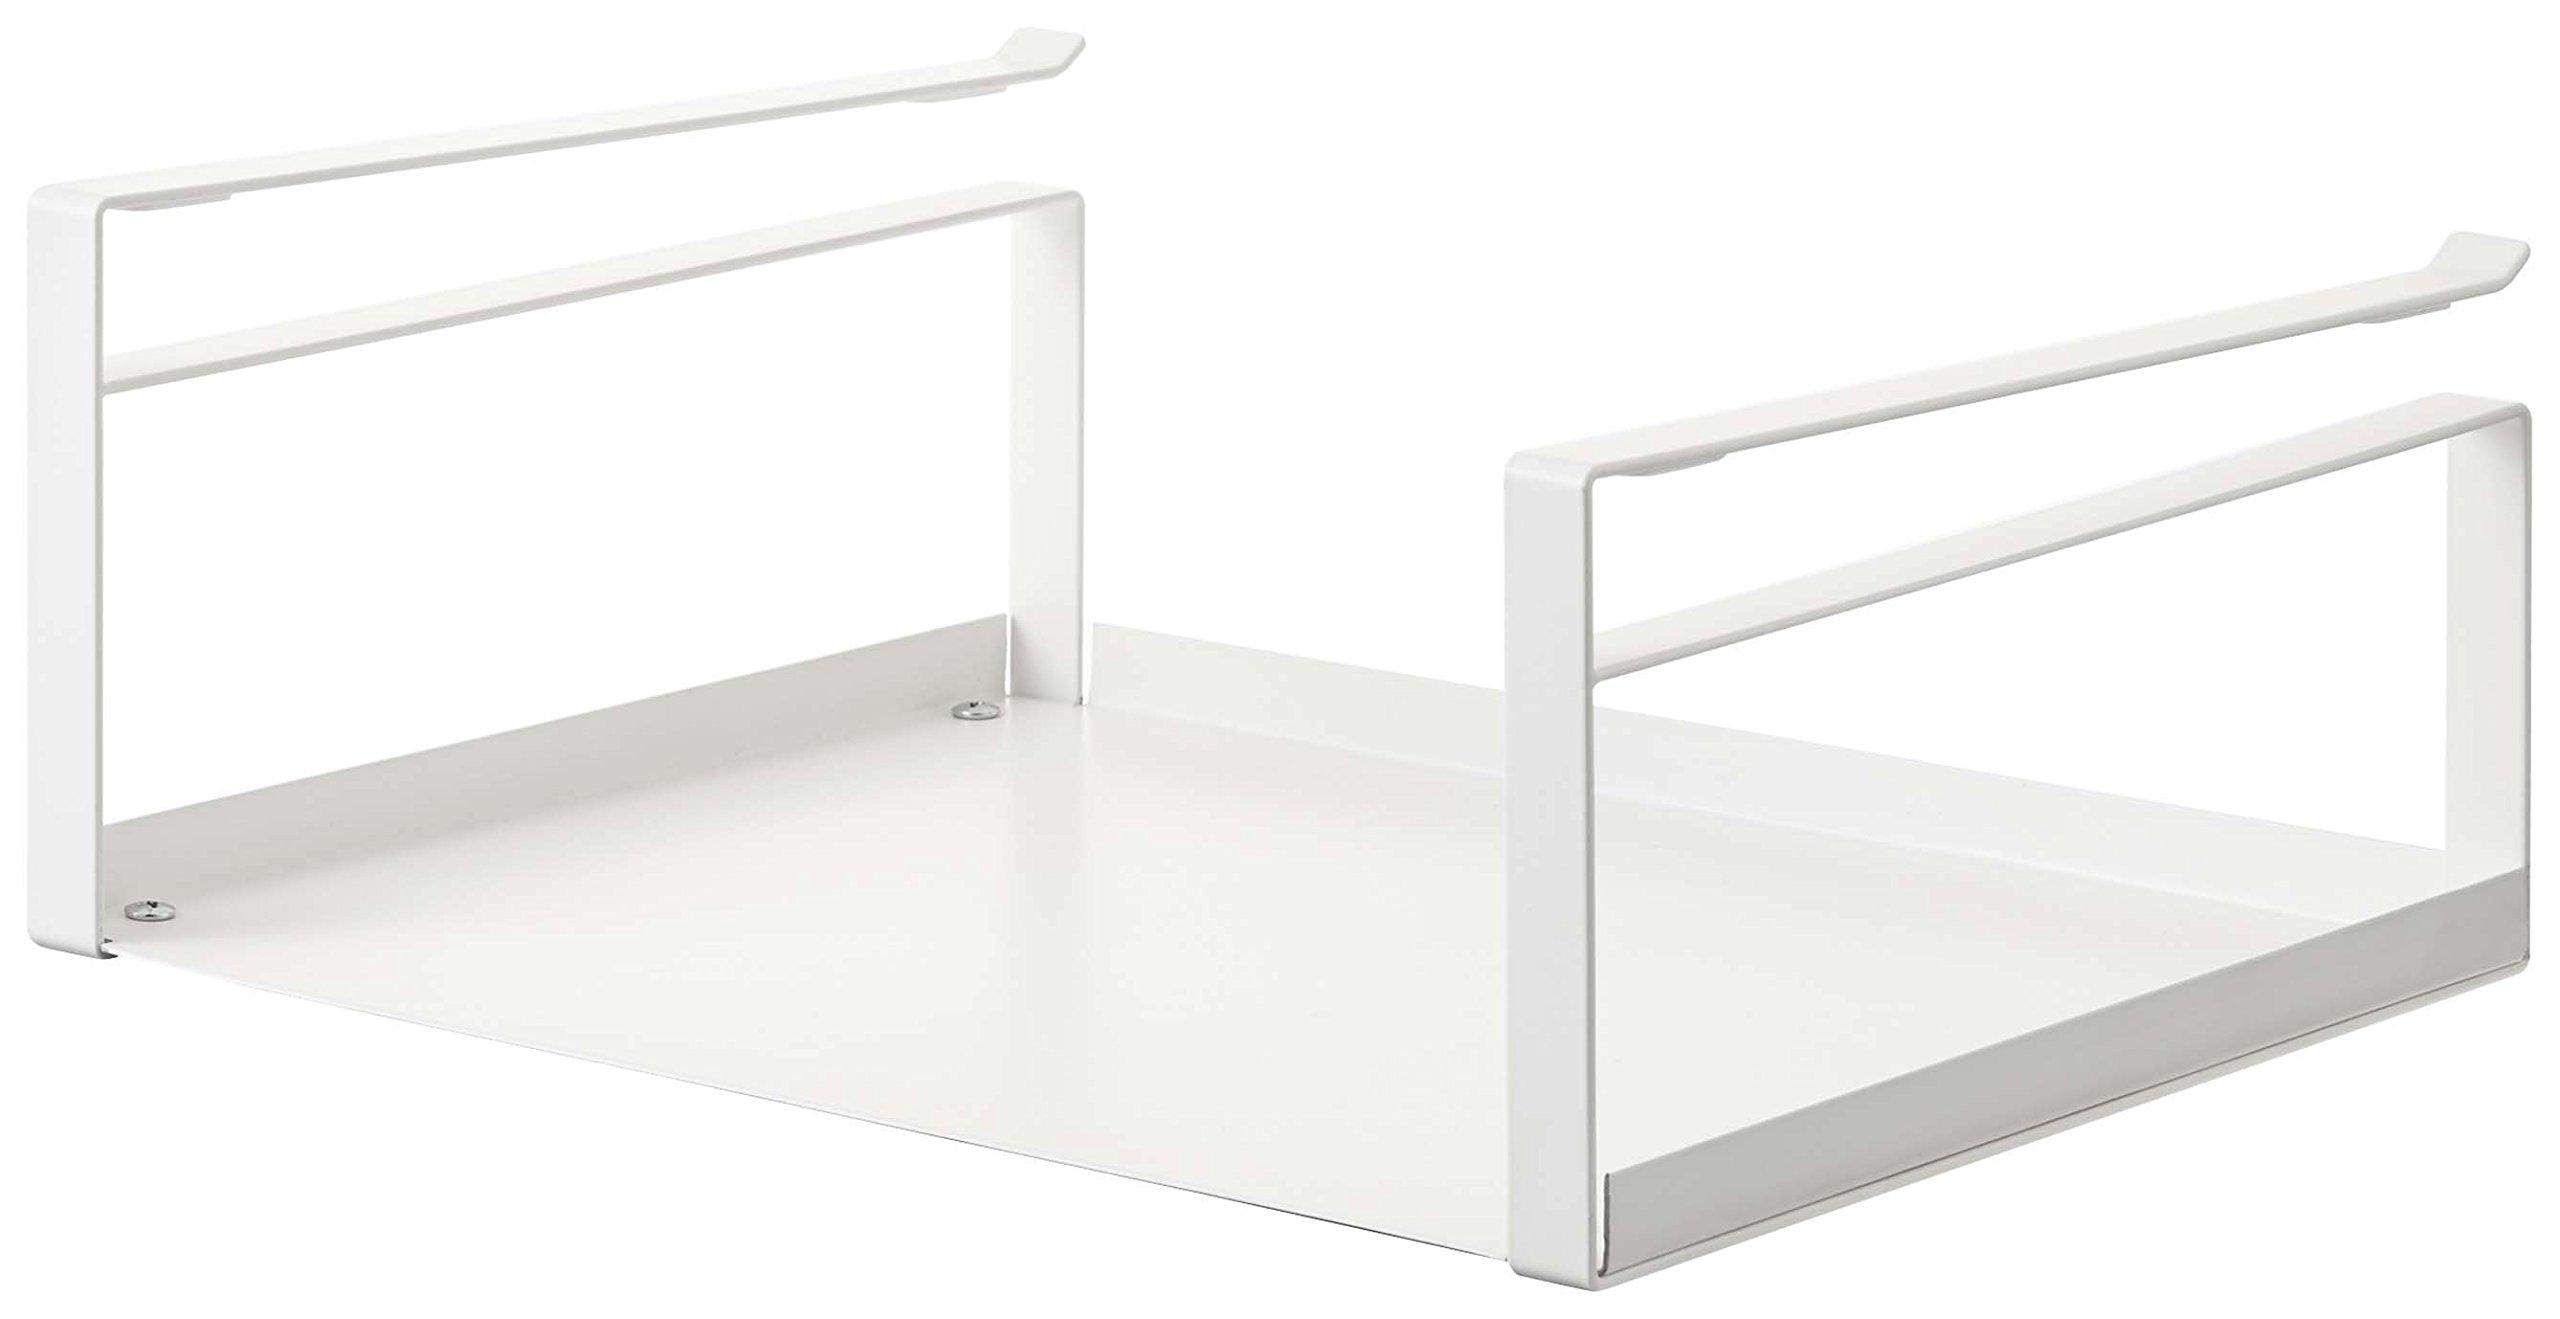 YAMAZAKI home 2443 Plate Under Shelf Storage Rack, White